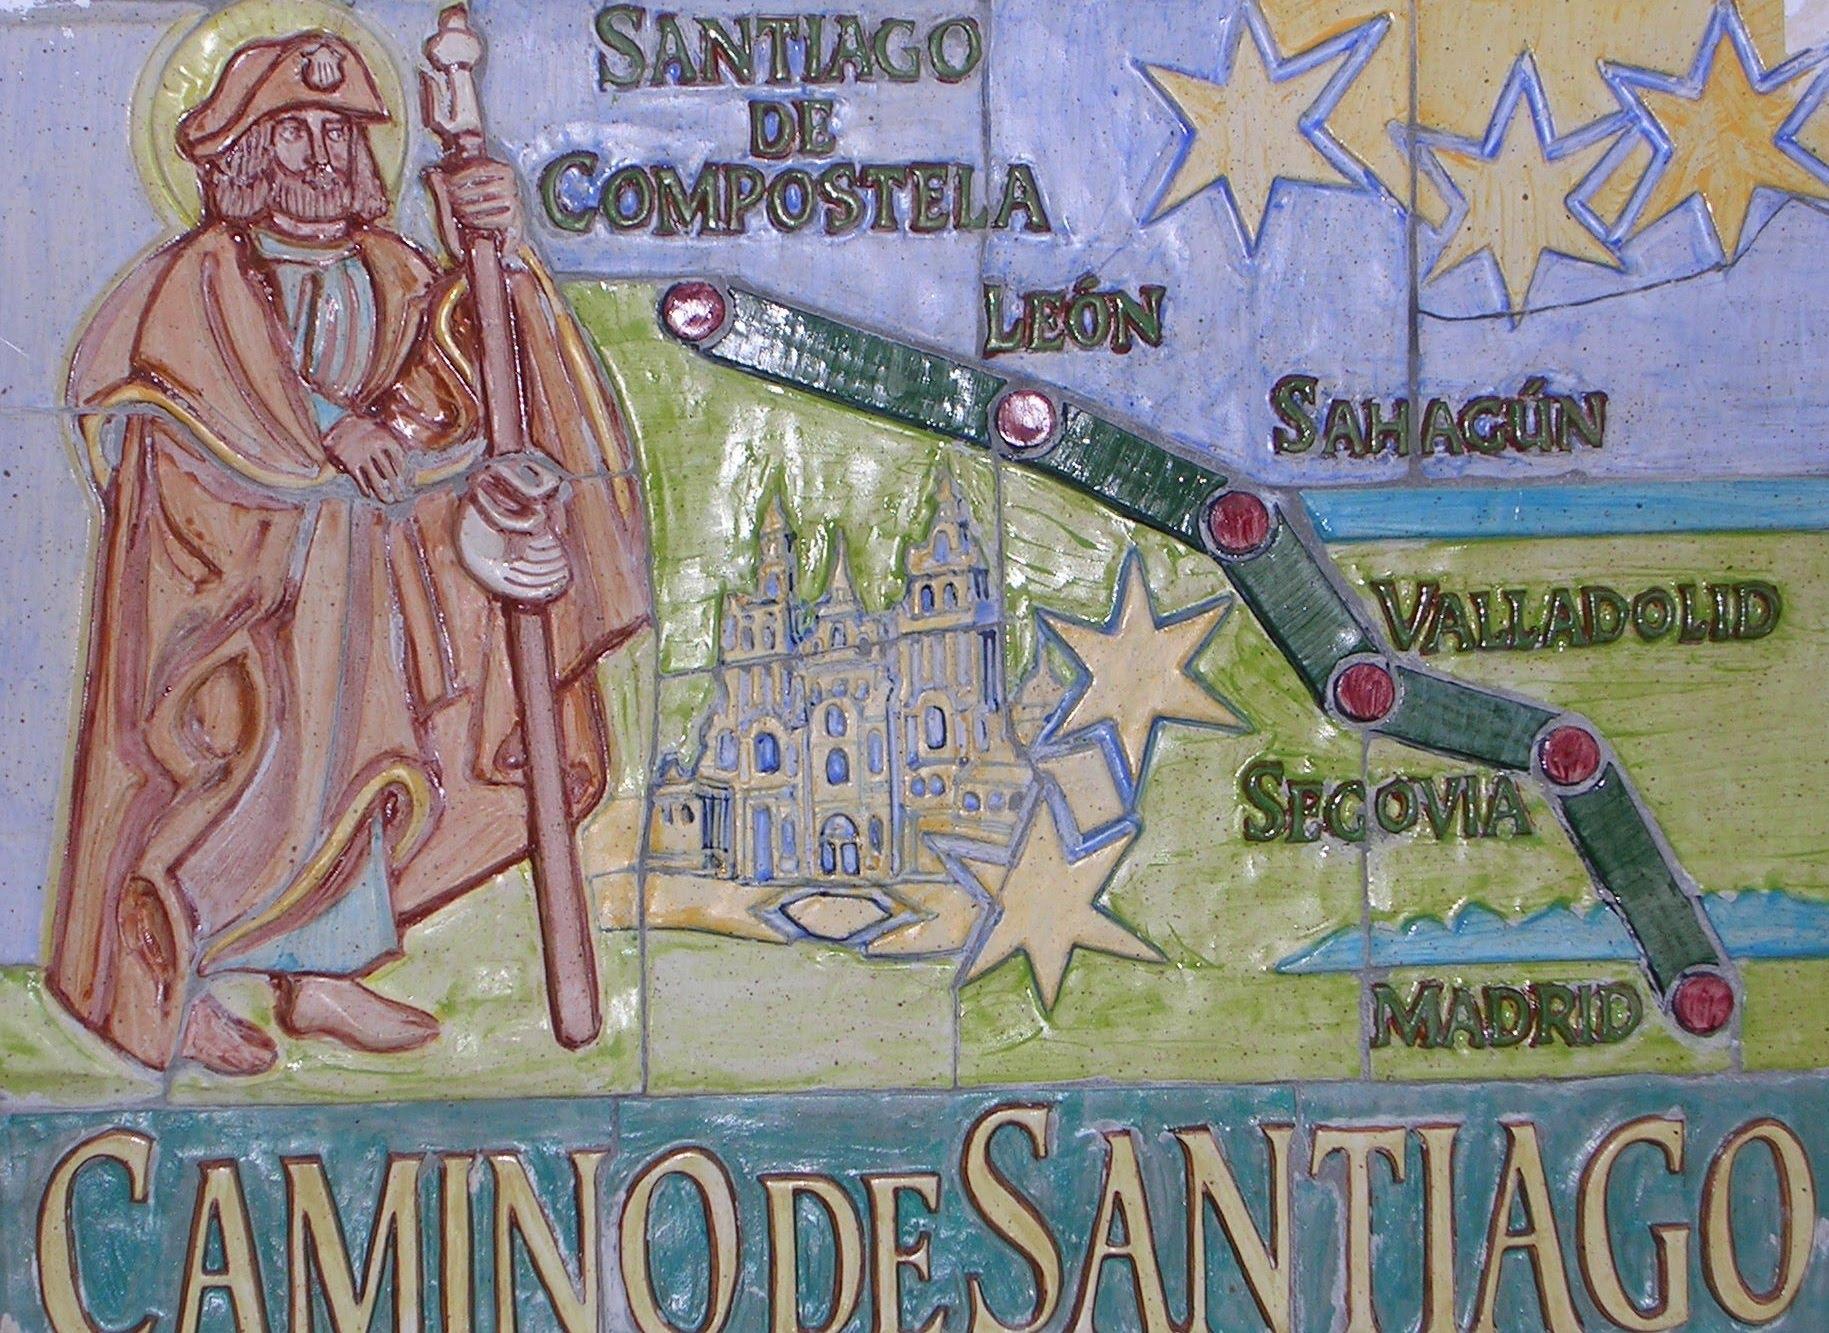 https://www.caminosantiago.org/cpperegrino/caminos/caminover.asp?kCamino=ES12a&CaminoId=11